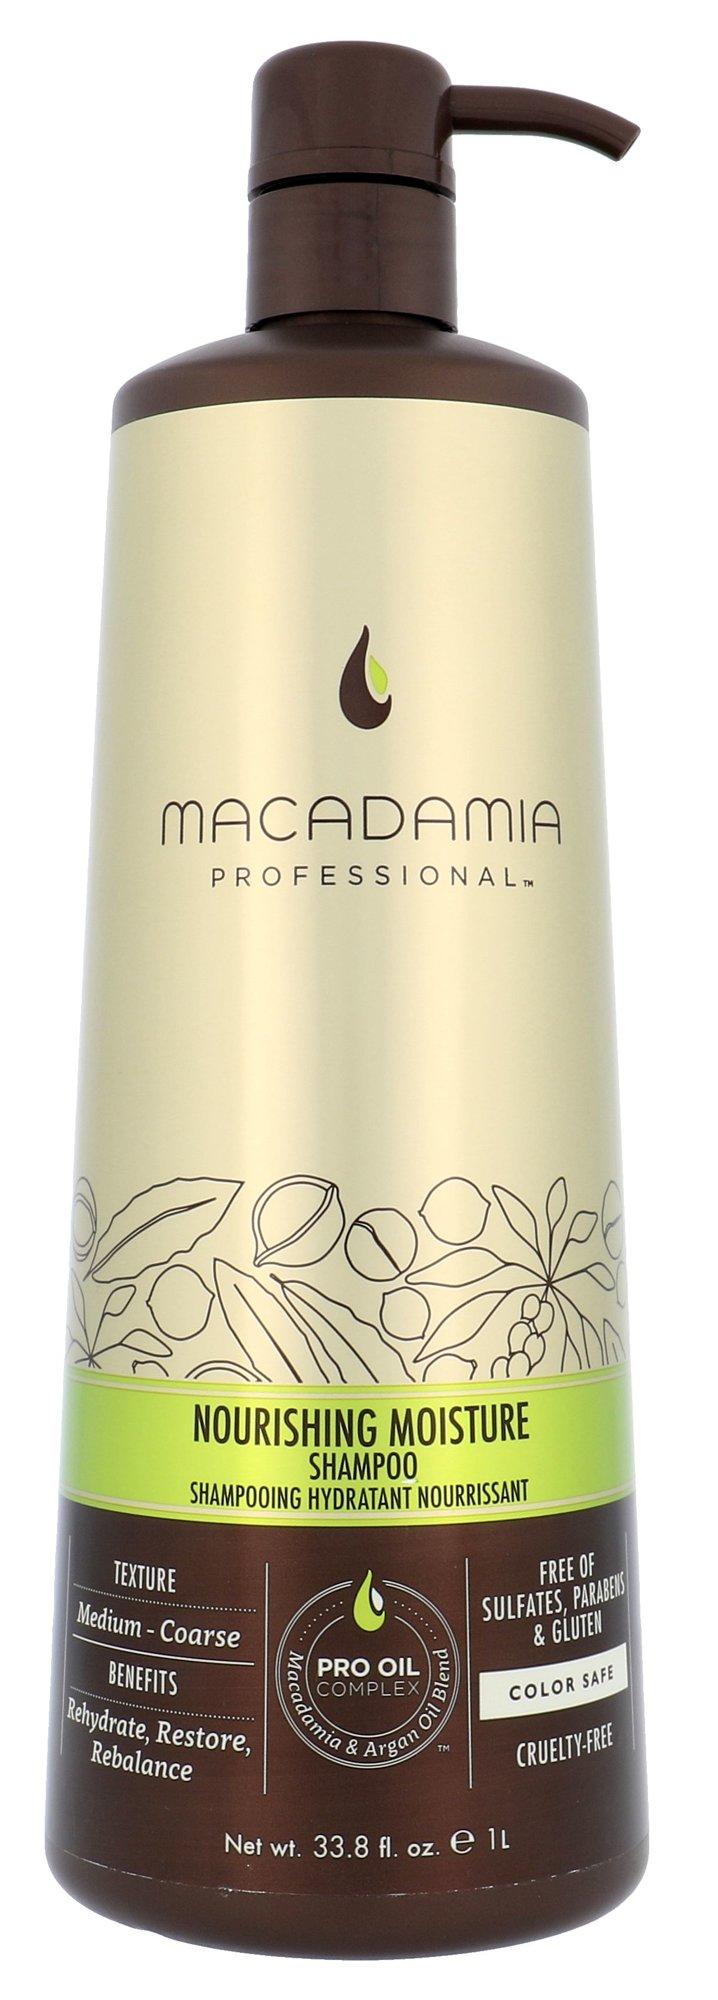 Macadamia Professional Nourishing Moisture Cosmetic 1000ml